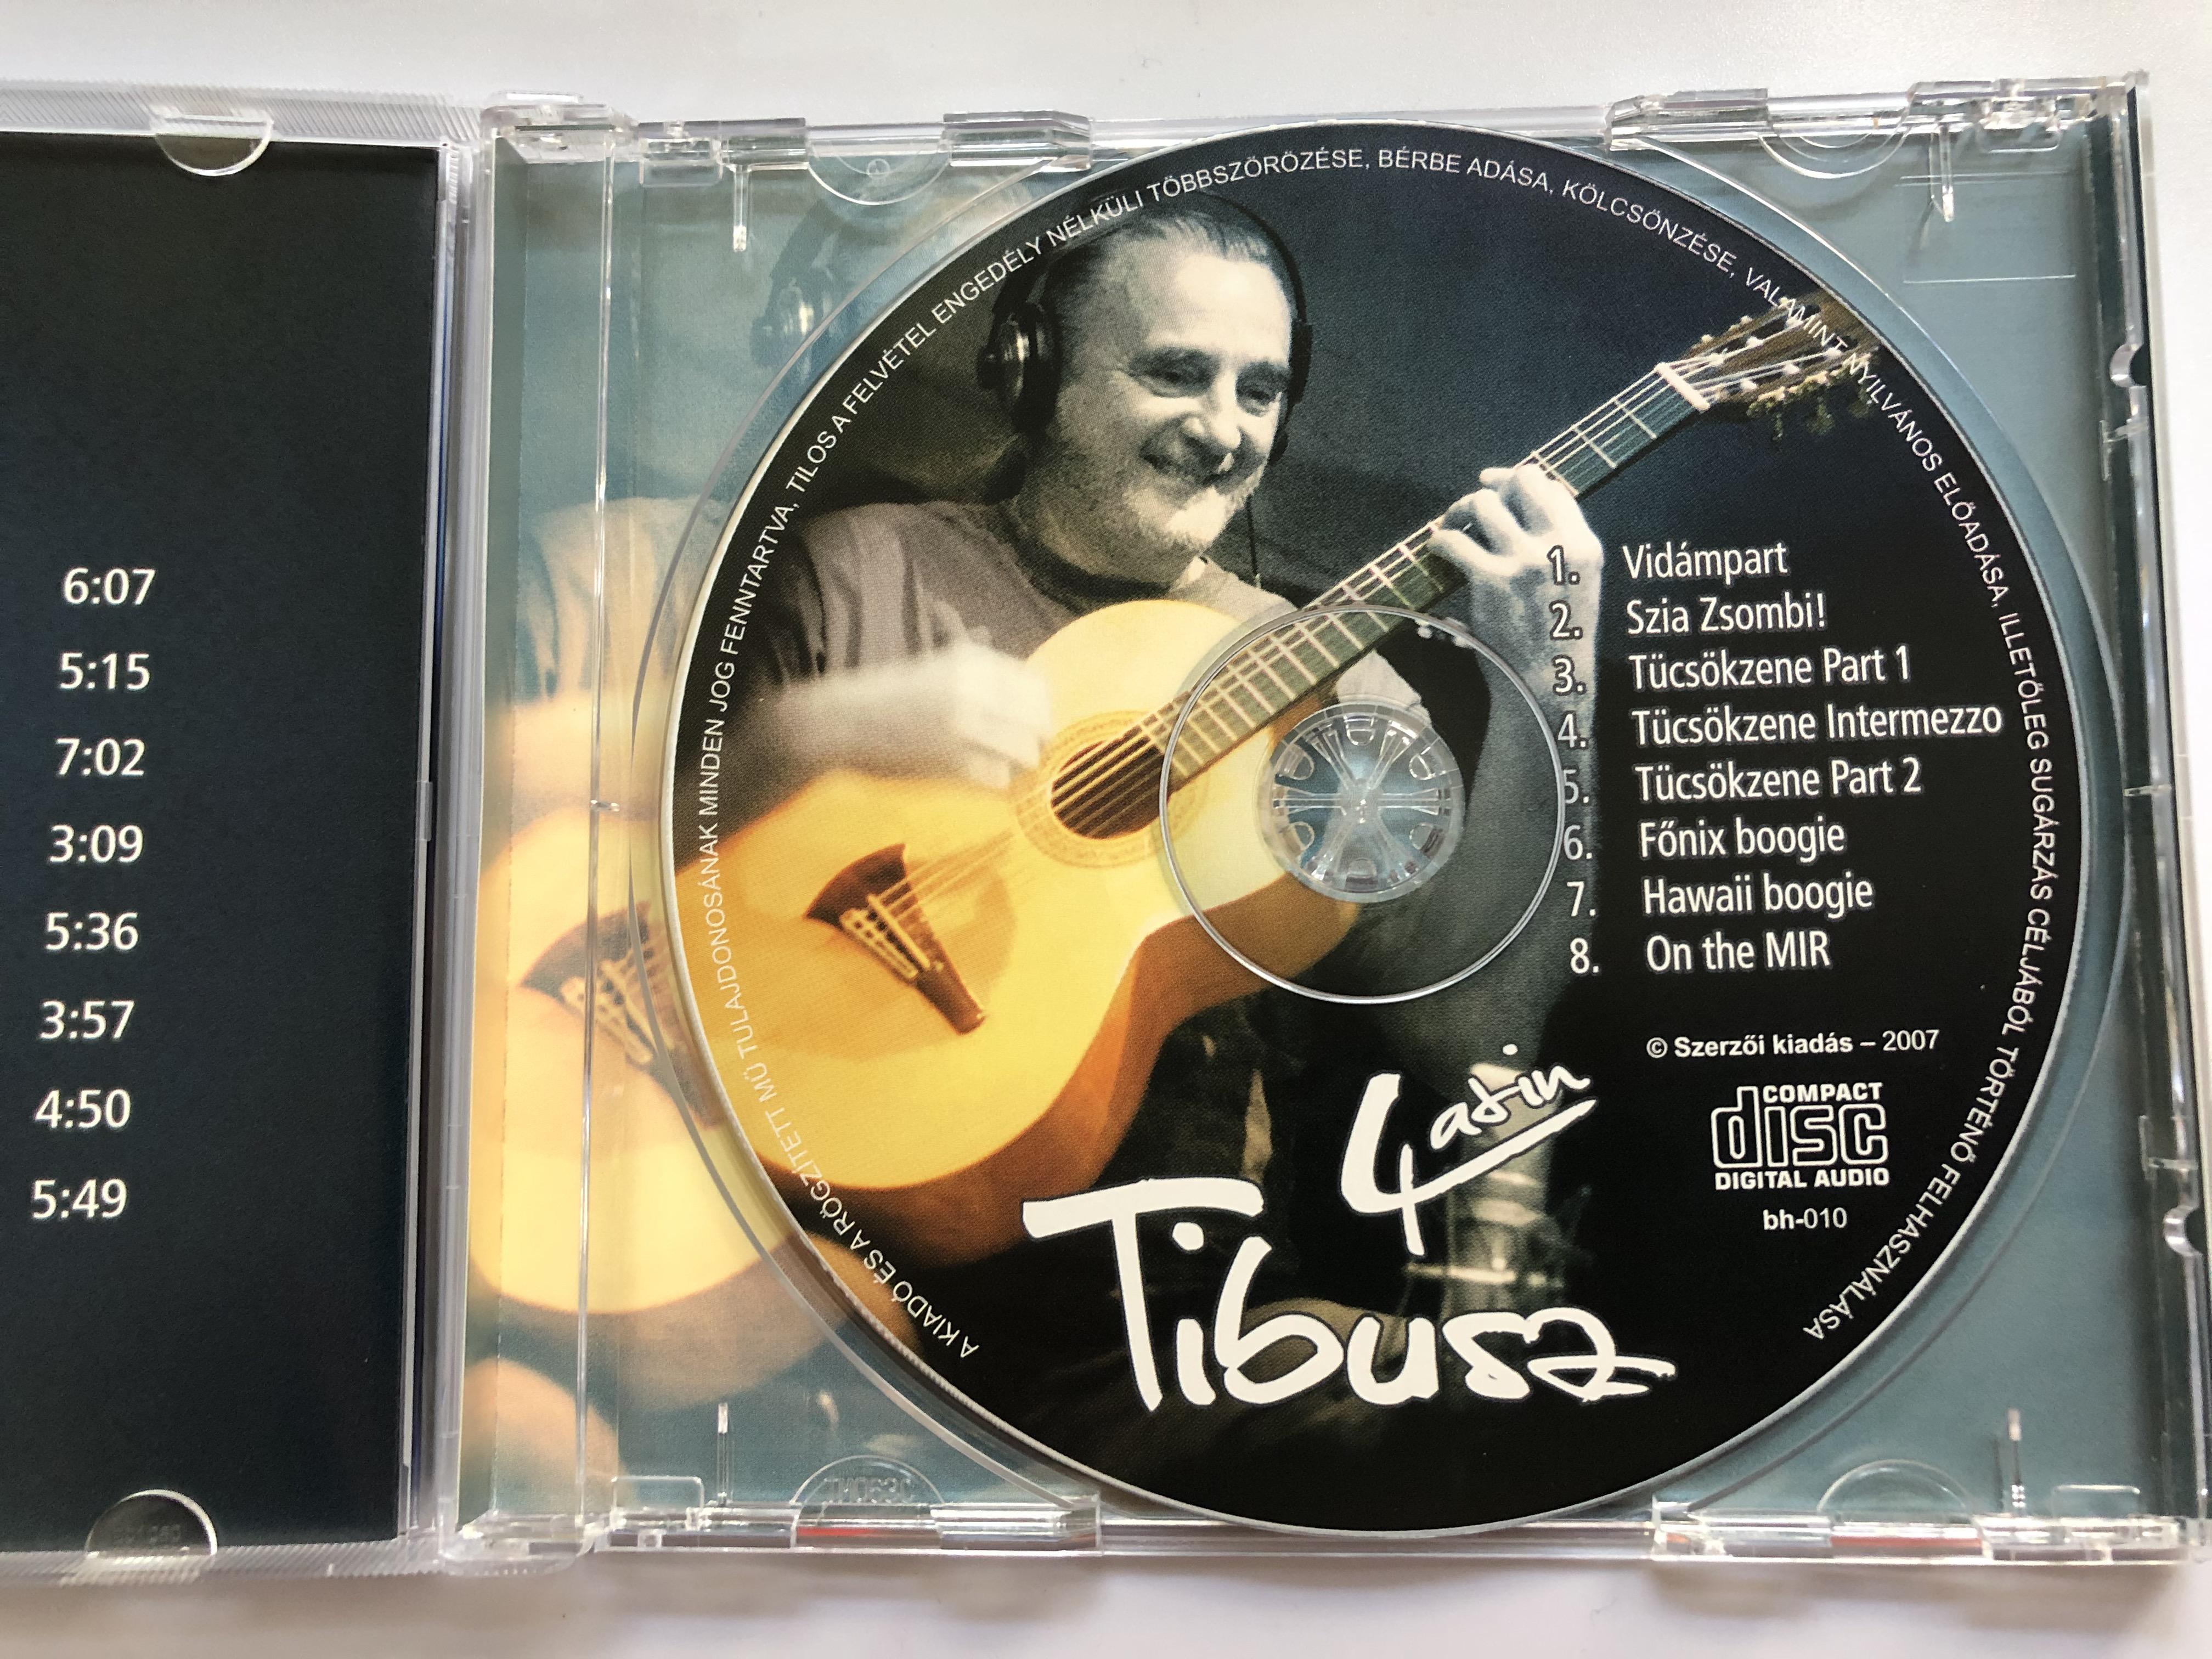 tibusz-4-latin-audio-cd-2007-bh-010-4-.jpg